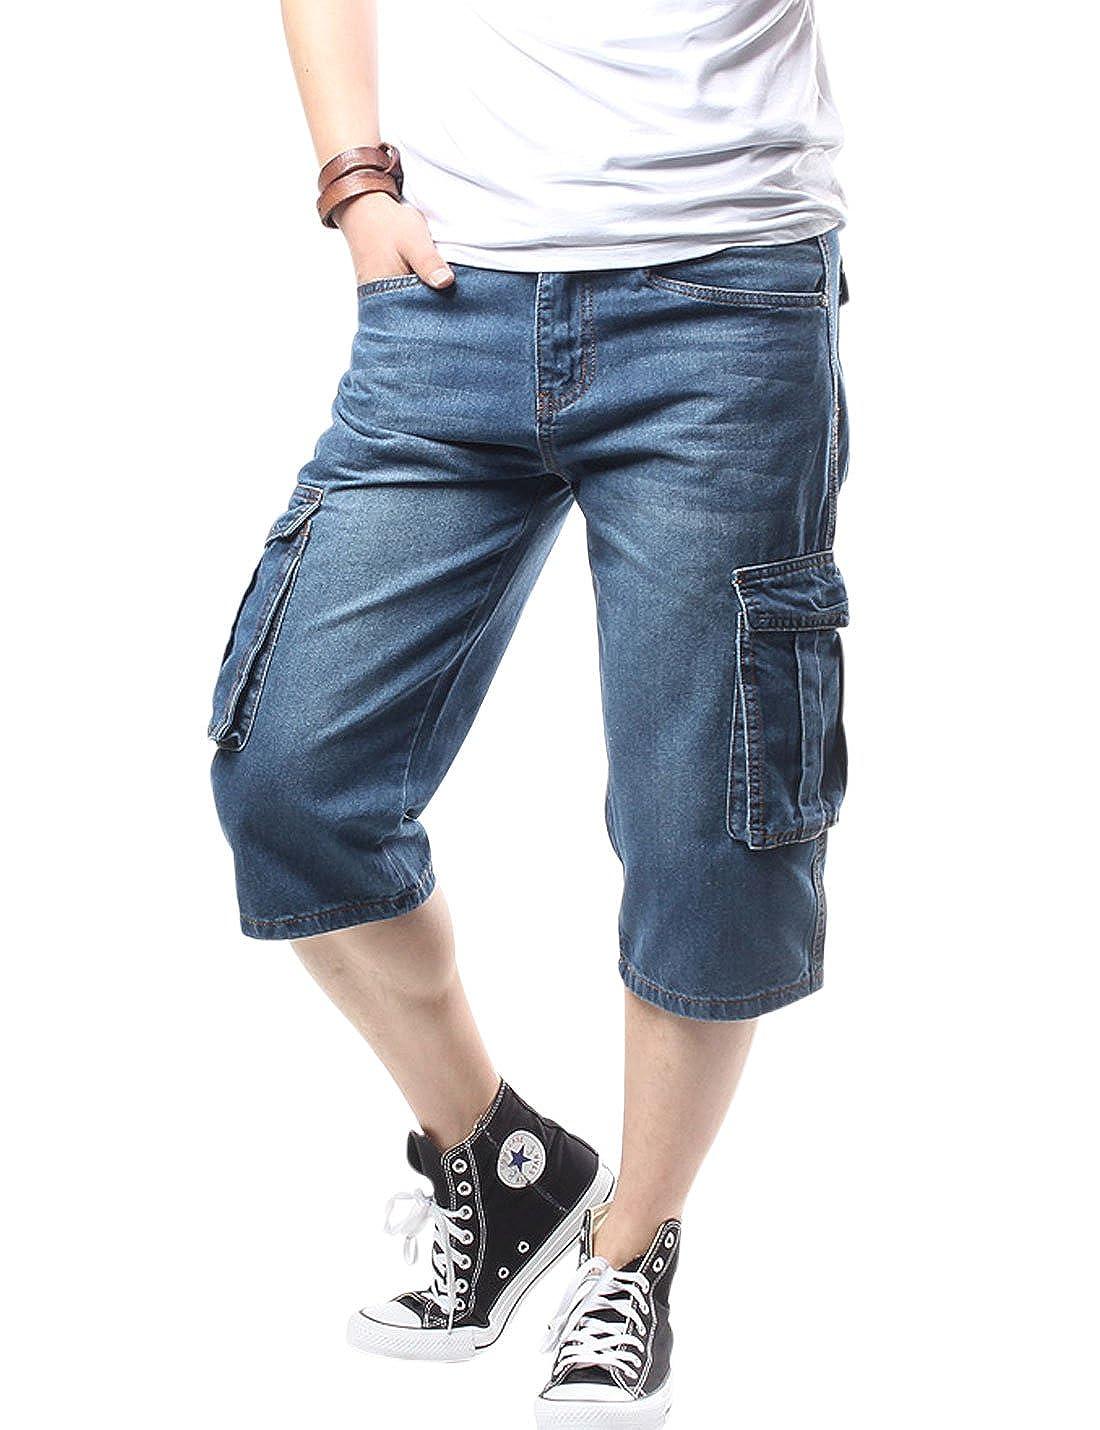 Yeokou Men's Casual Loose Hip Hop Denim Cropped Work Pants Cargo Shorts Jeans